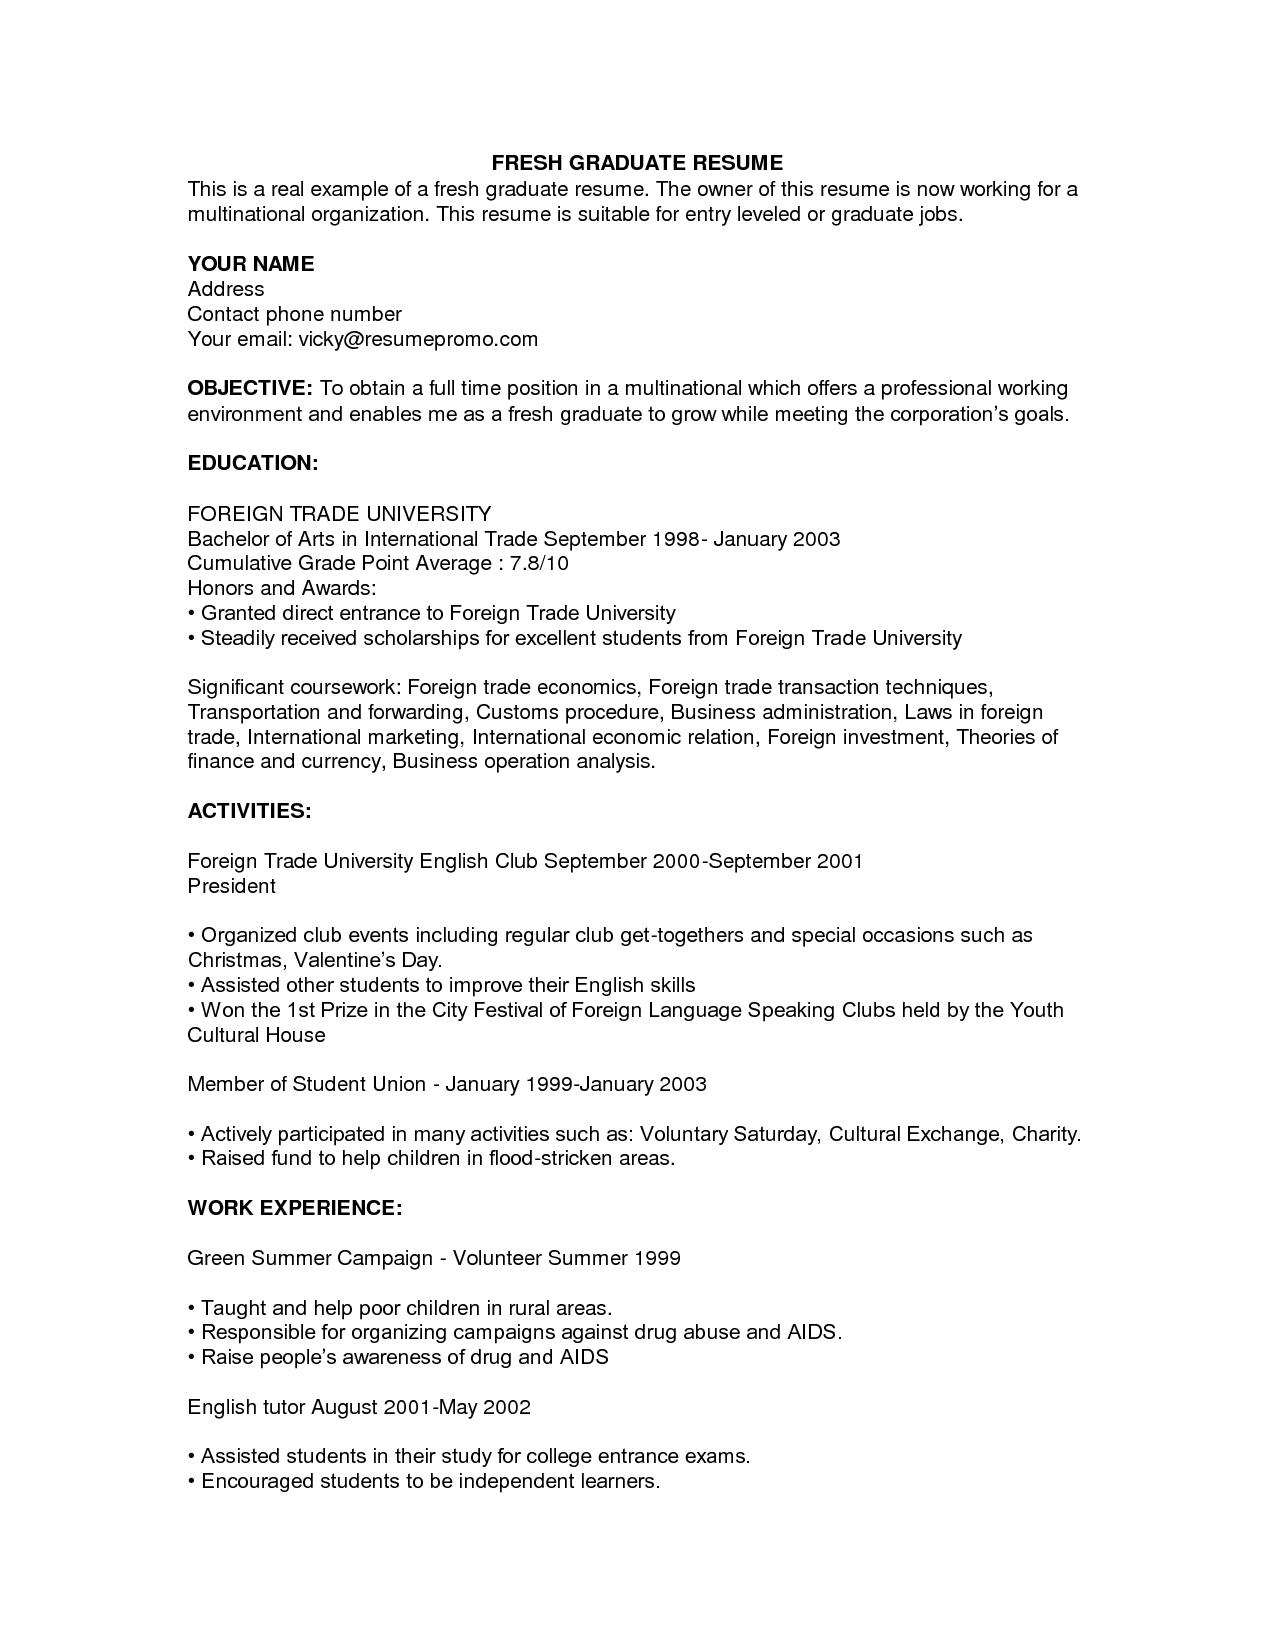 Example Of Resume For Fresh Graduate Resumecareer